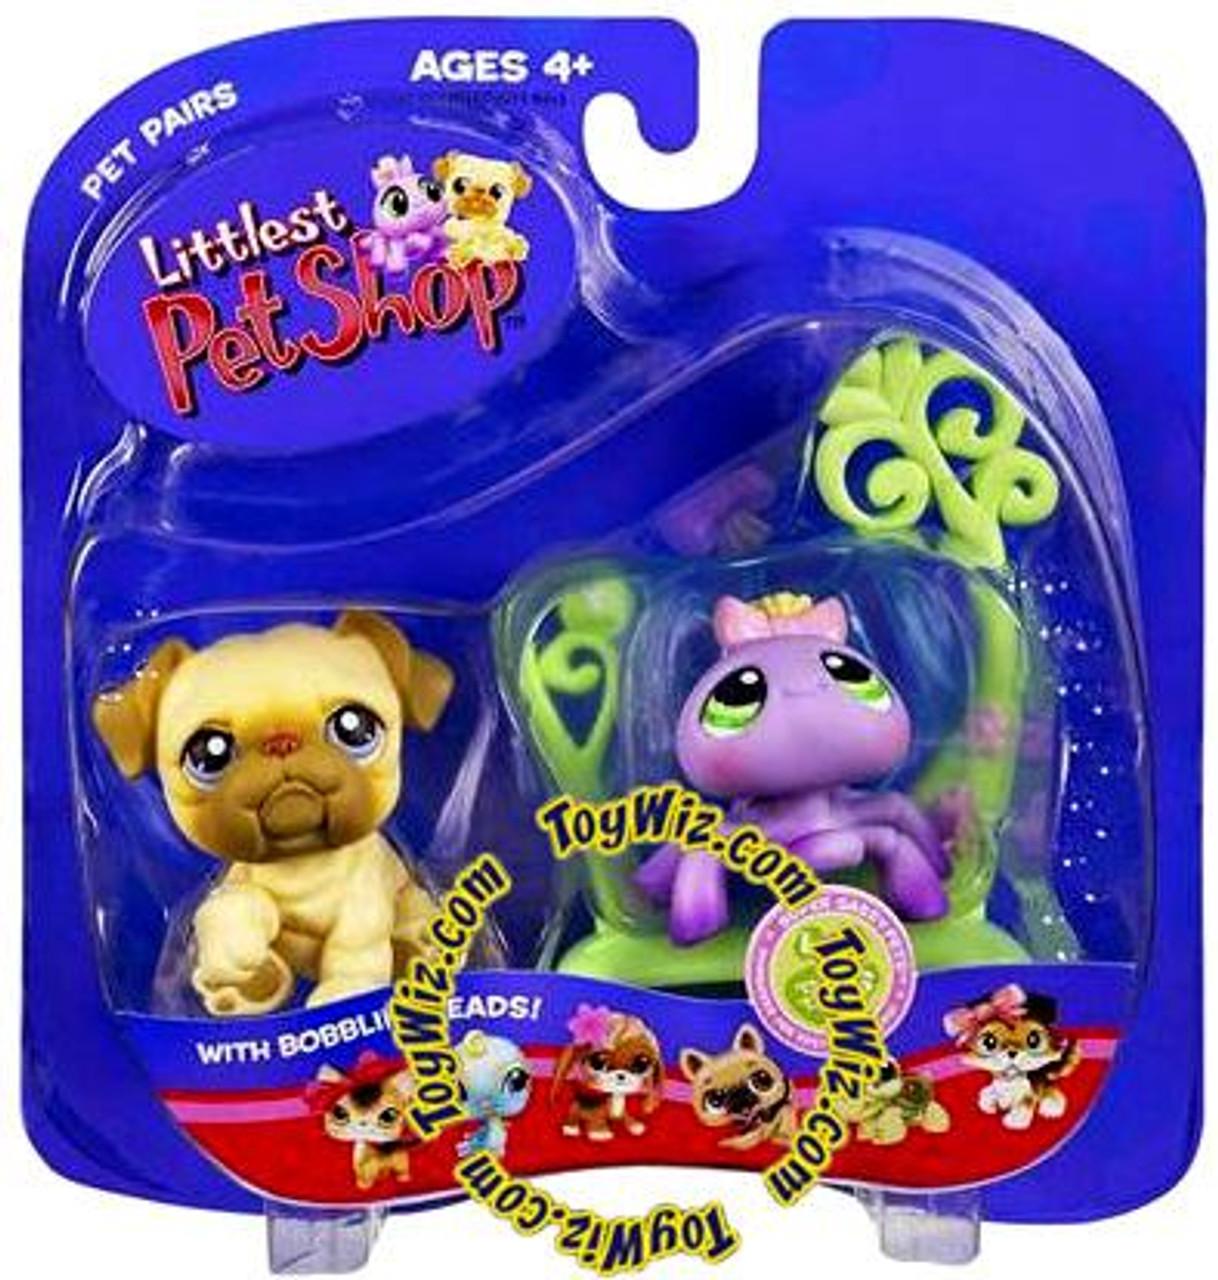 Littlest Pet Shop Pet Pairs Dog & Spider Figure 2-Pack